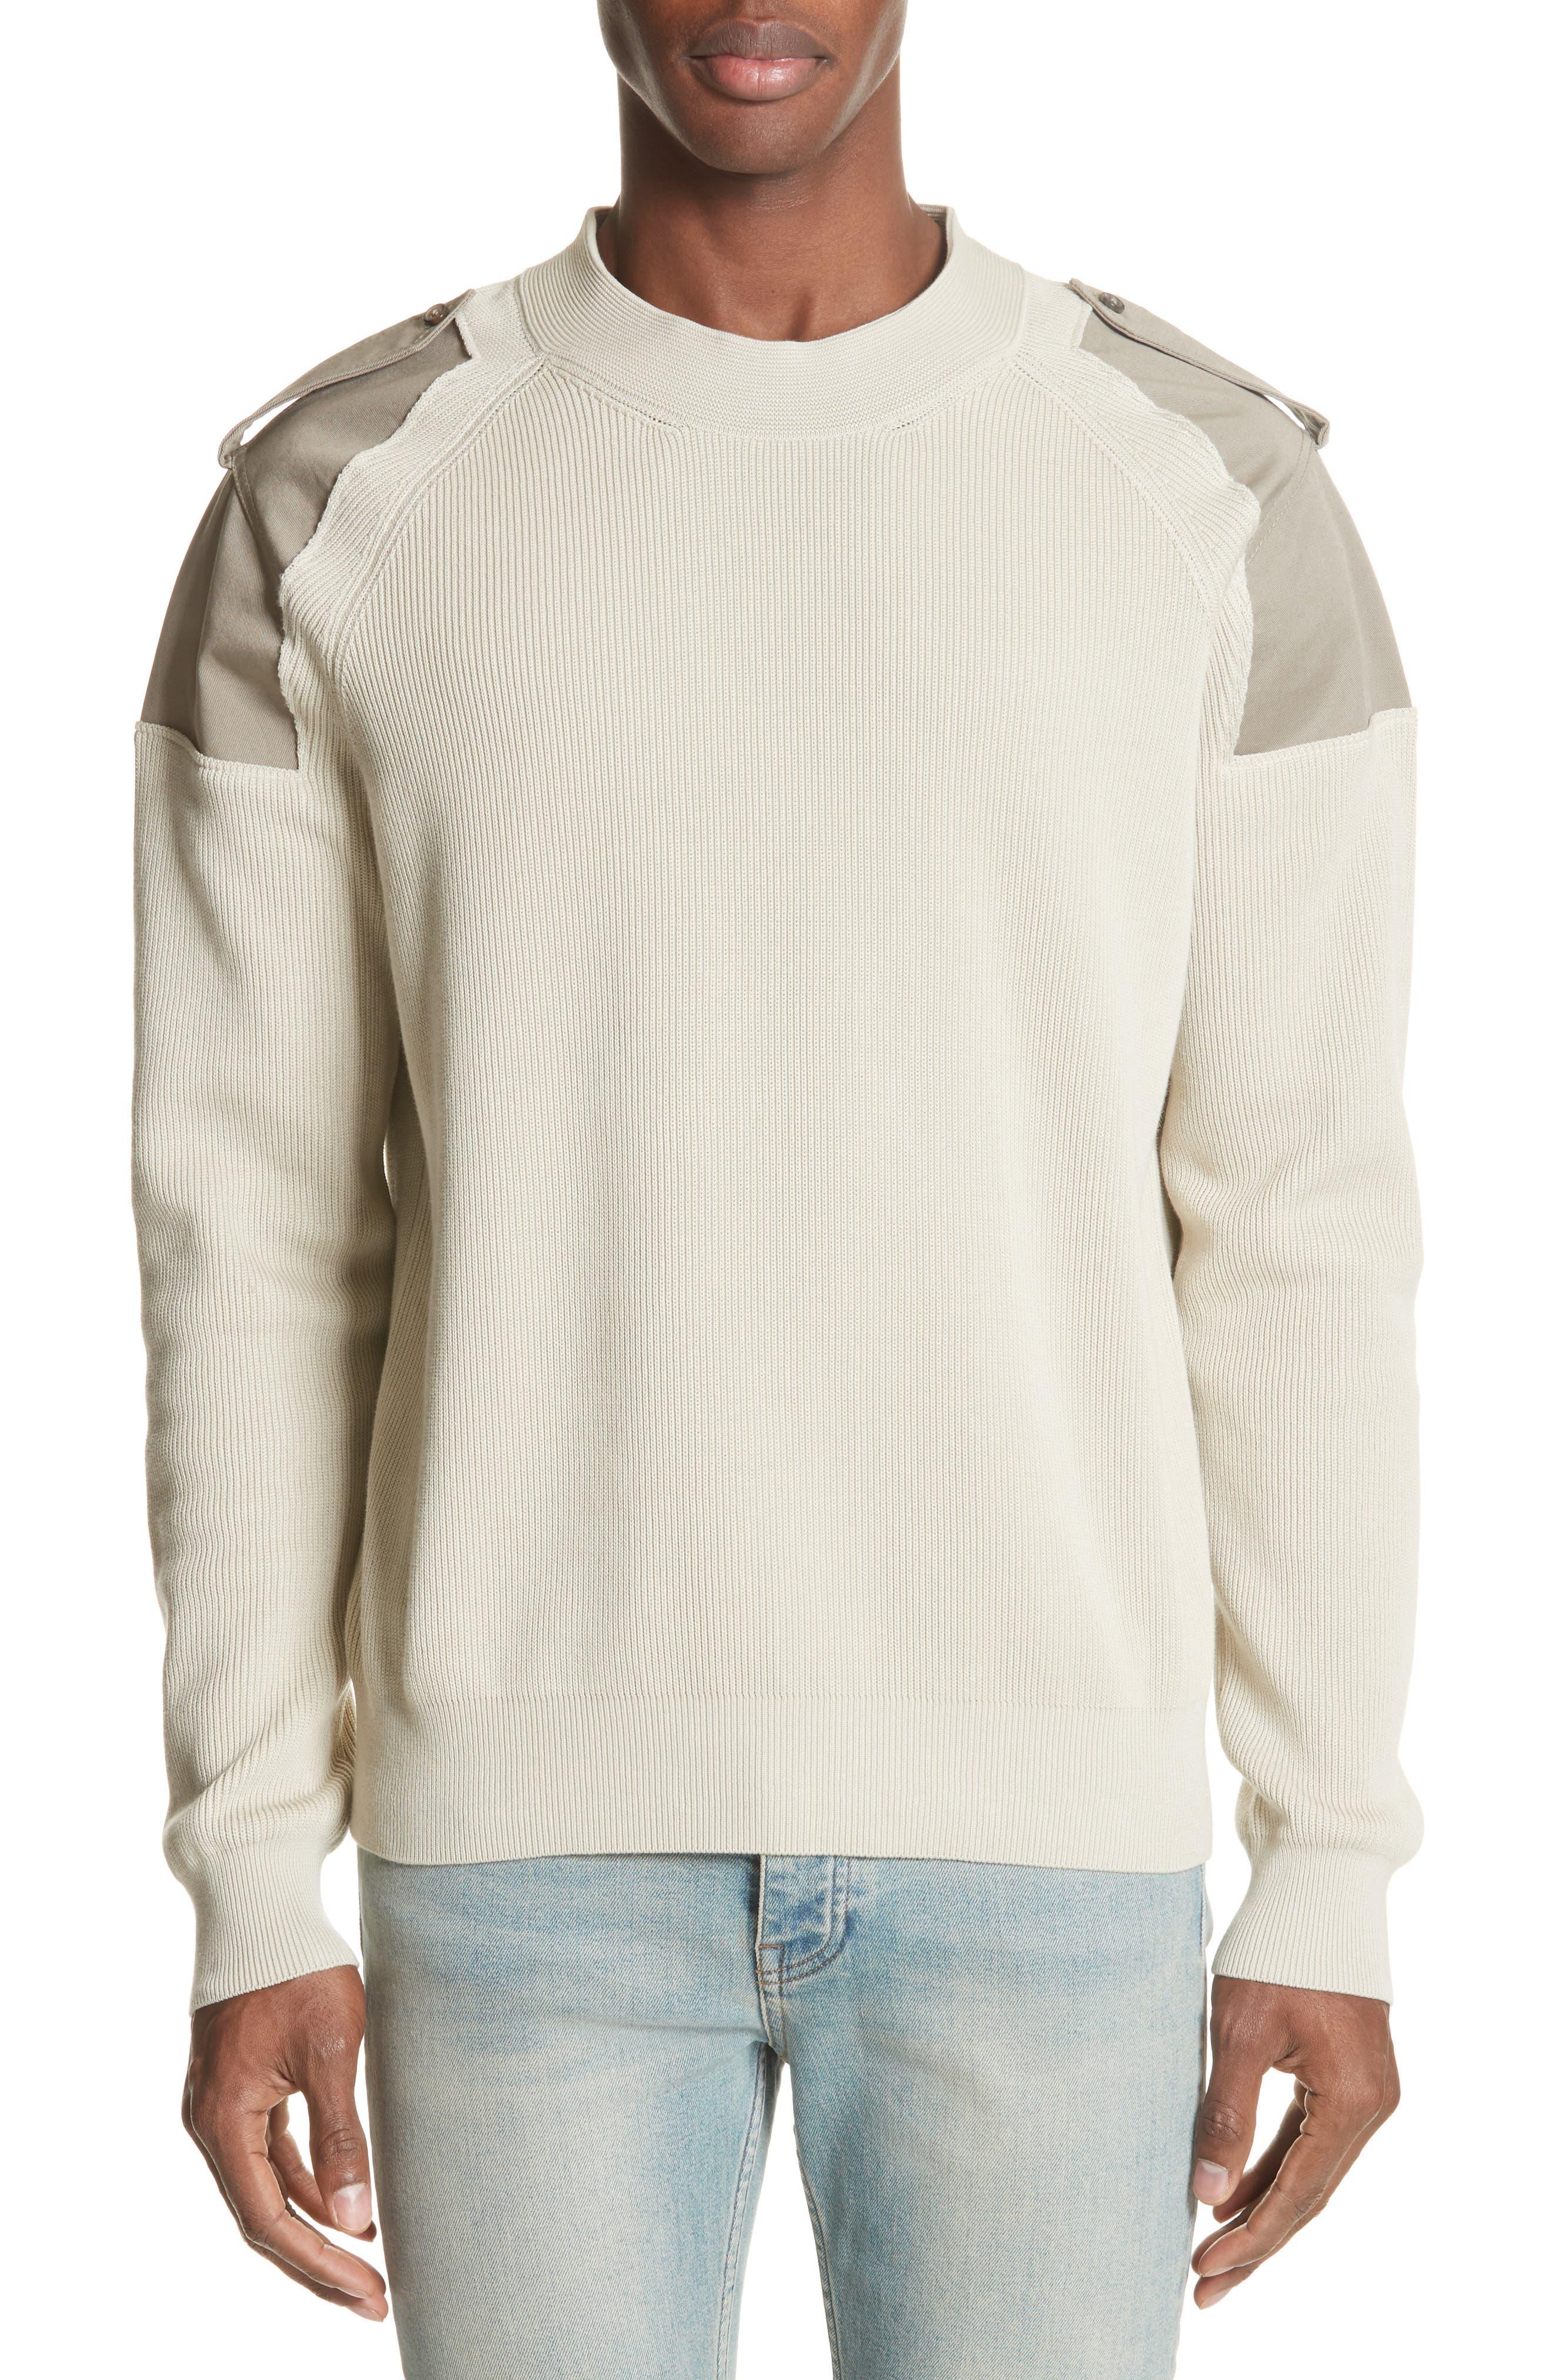 Maison Margiela Two-Tone Military Sweater